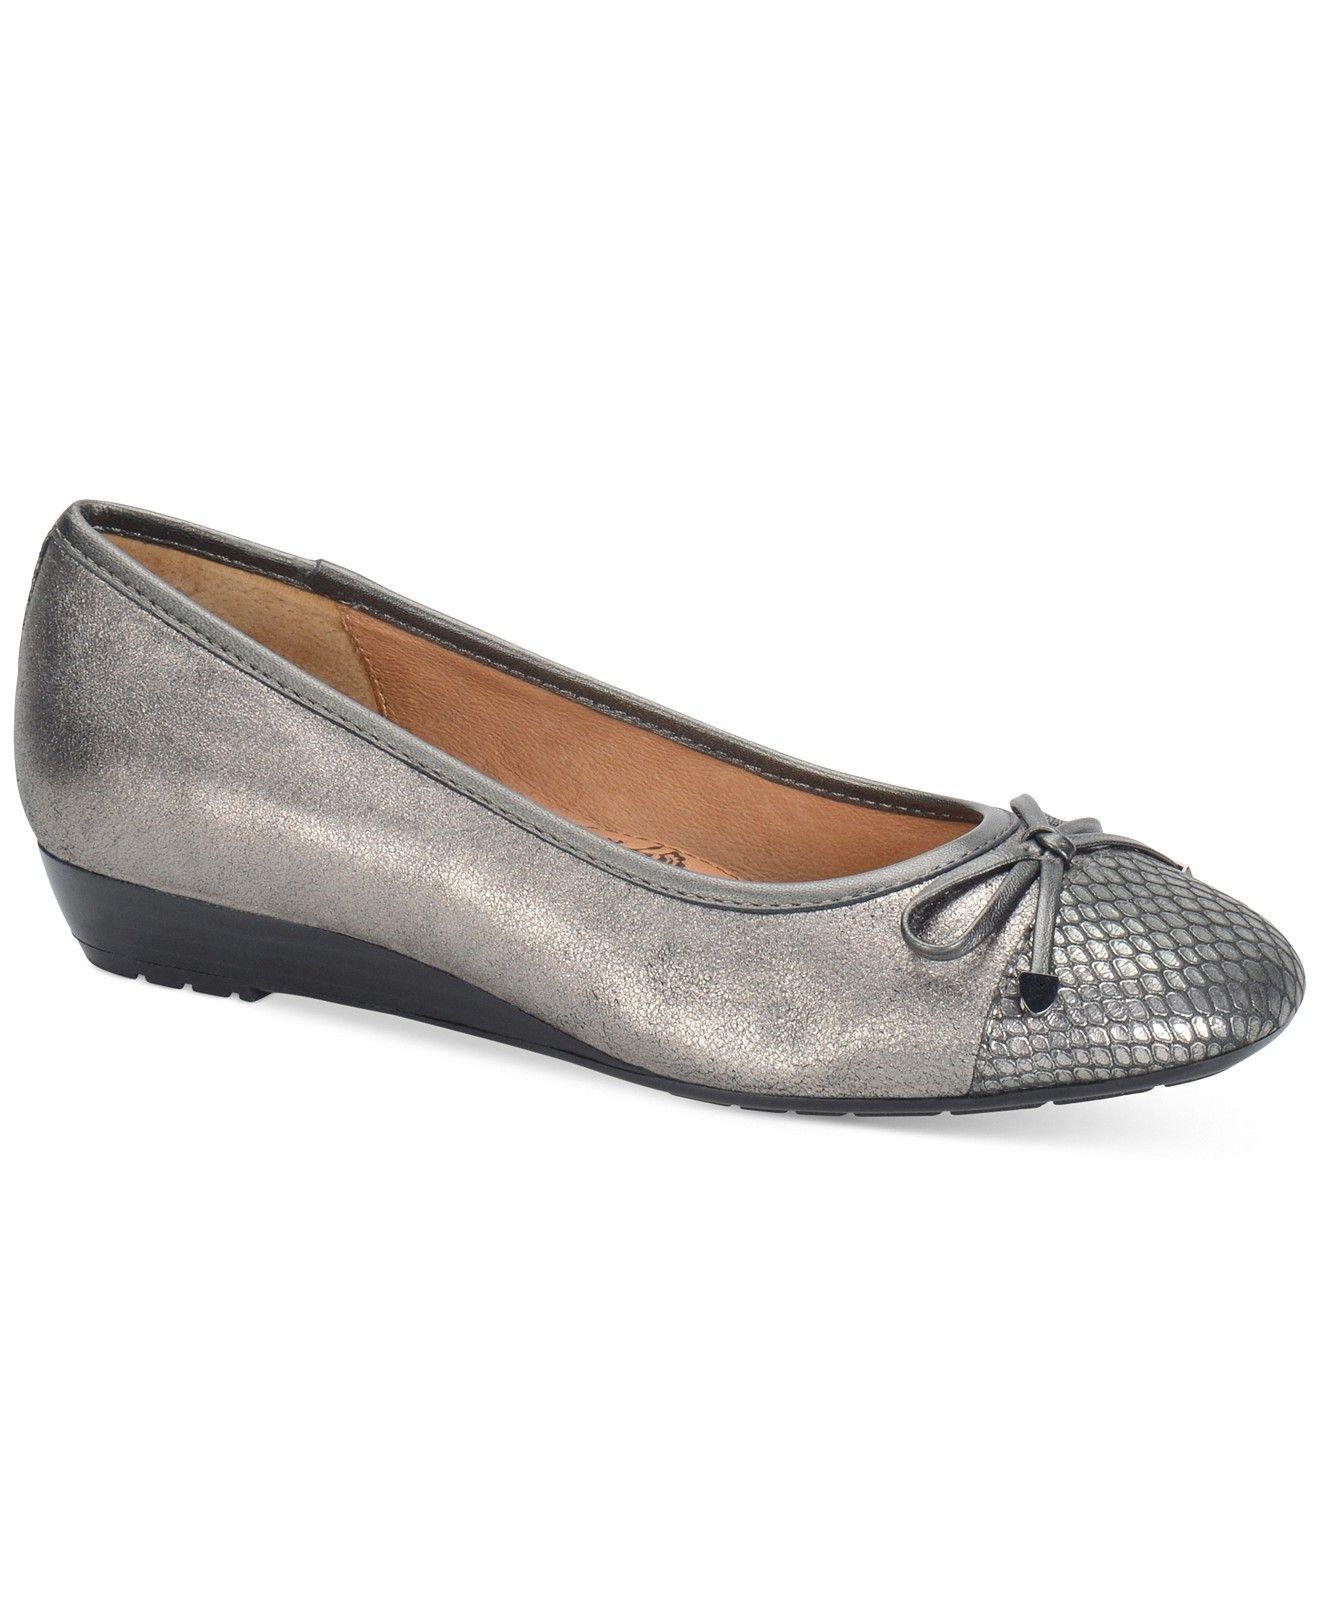 Sofft Selima Flats - Comfort - Shoes - Macy's